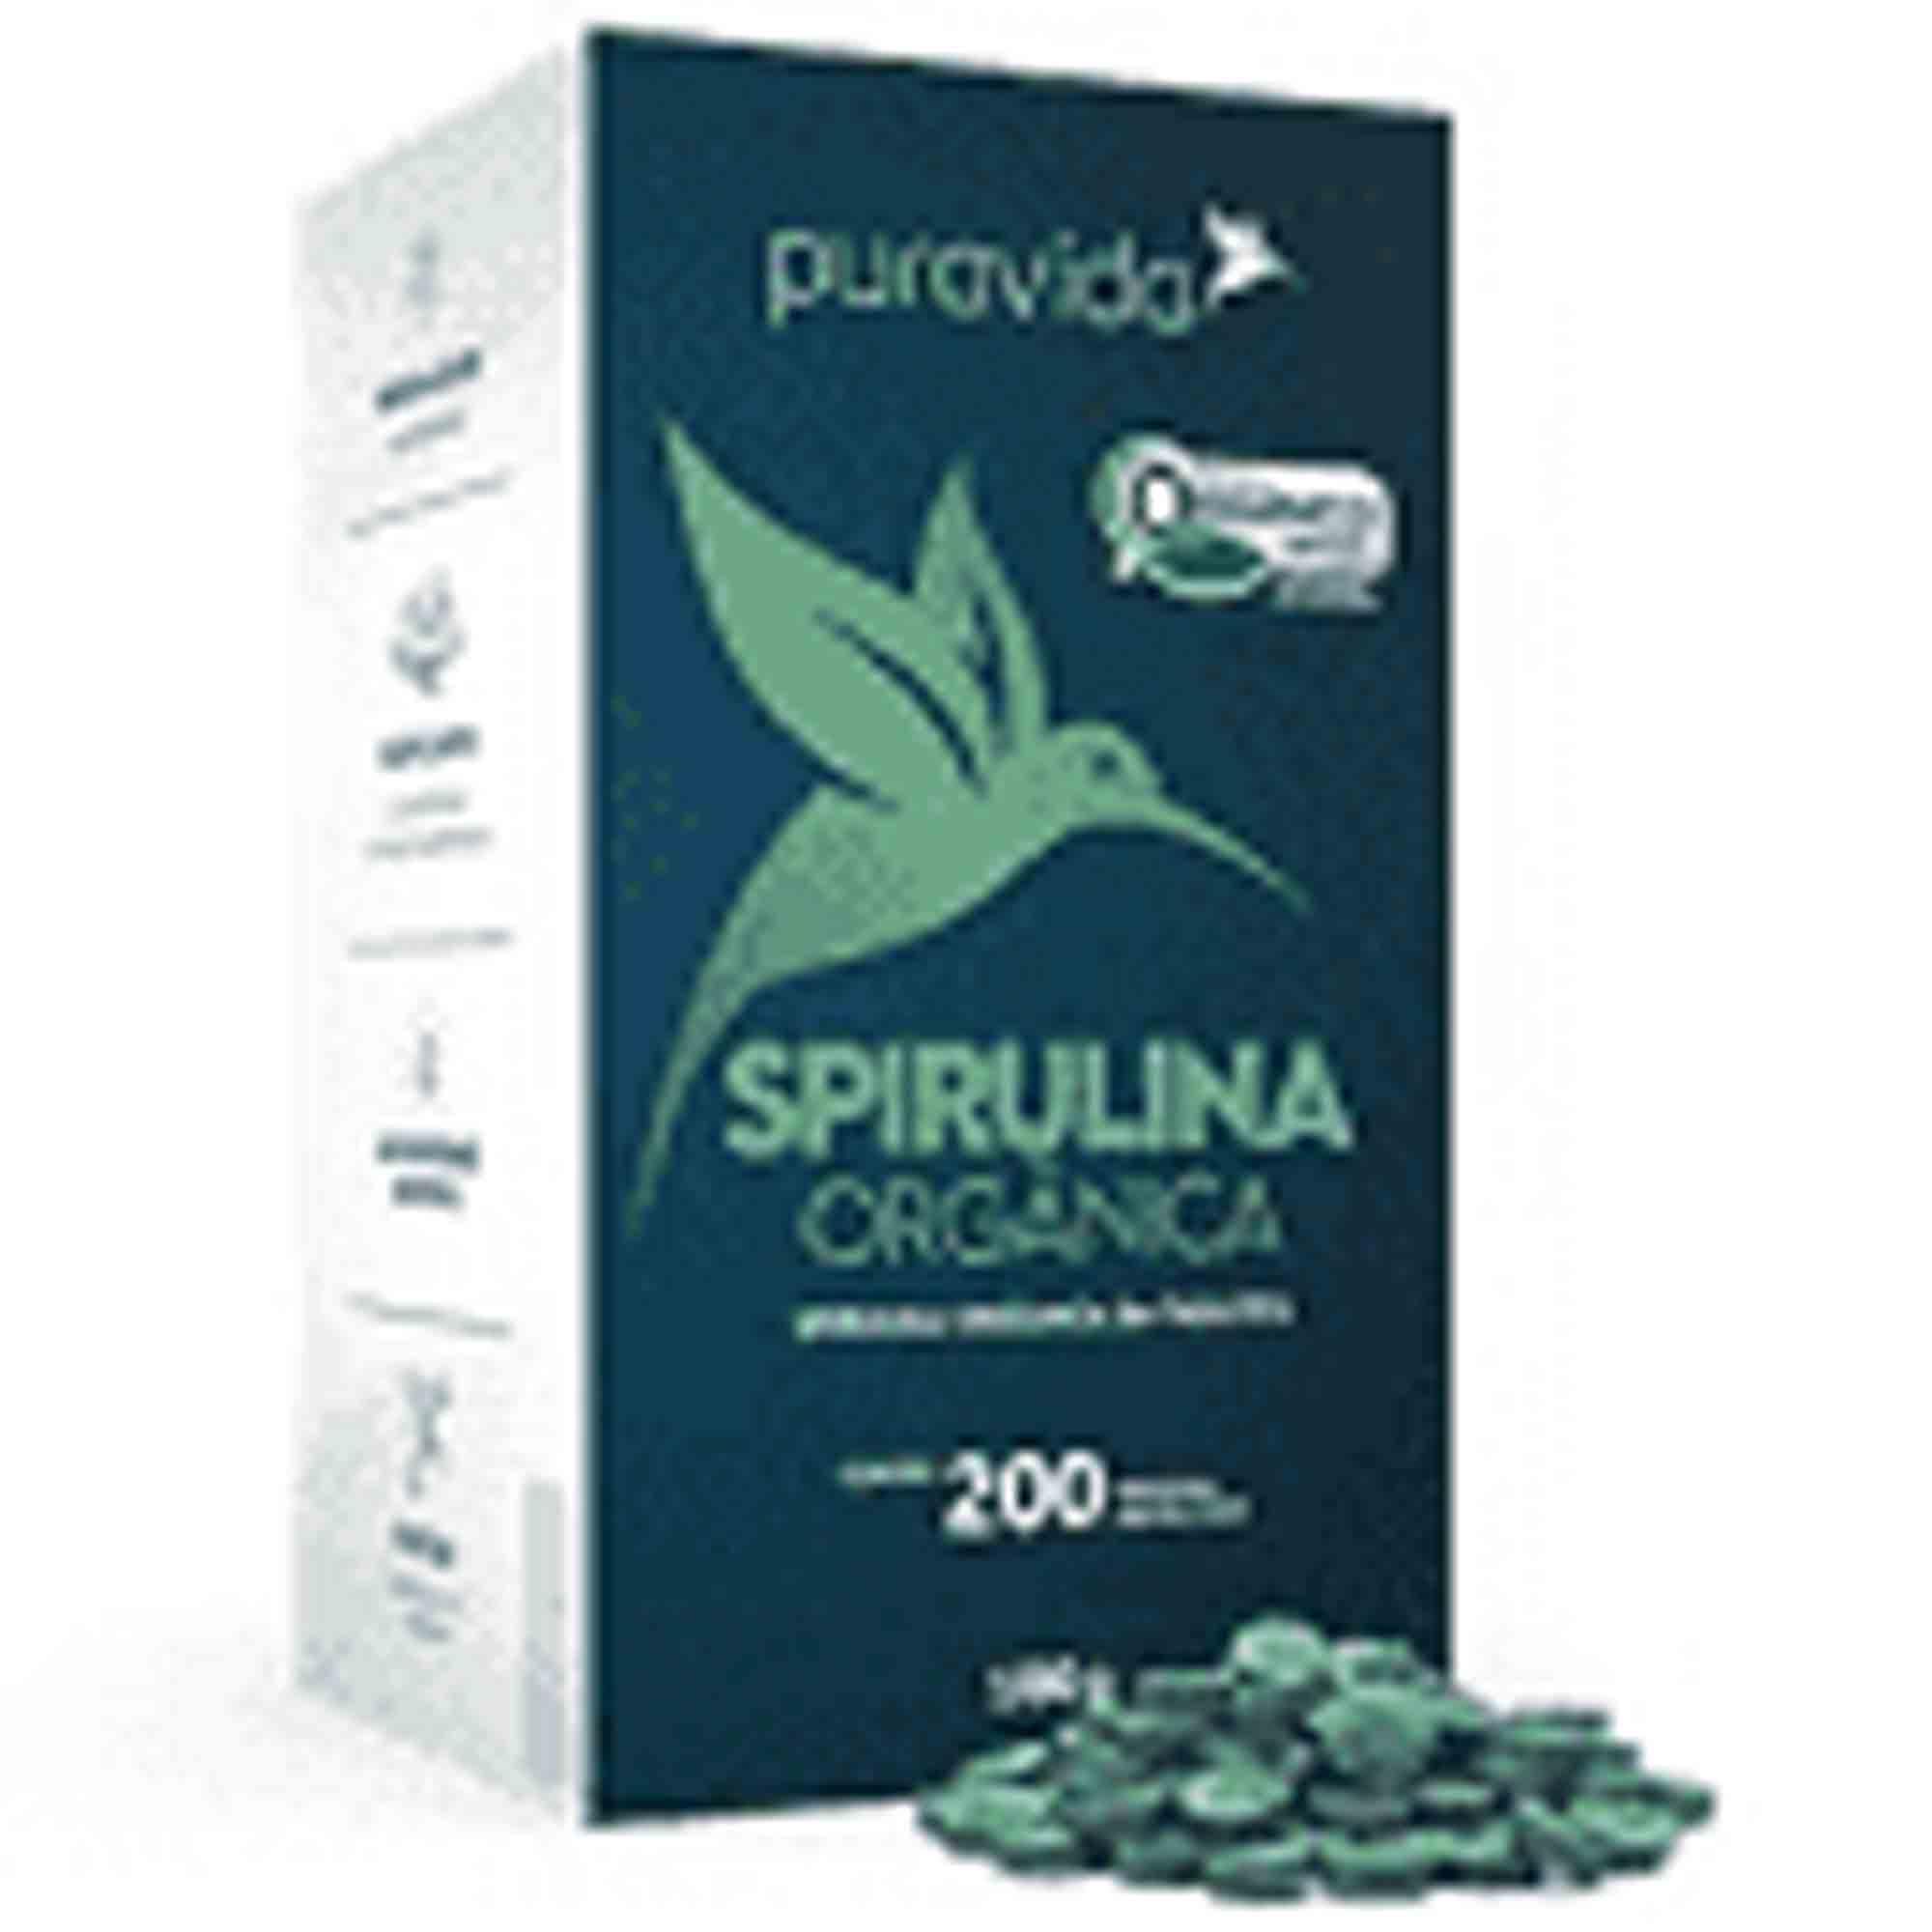 Spirulina Orgânica Premium 200 Tabl 100g Pura Vida